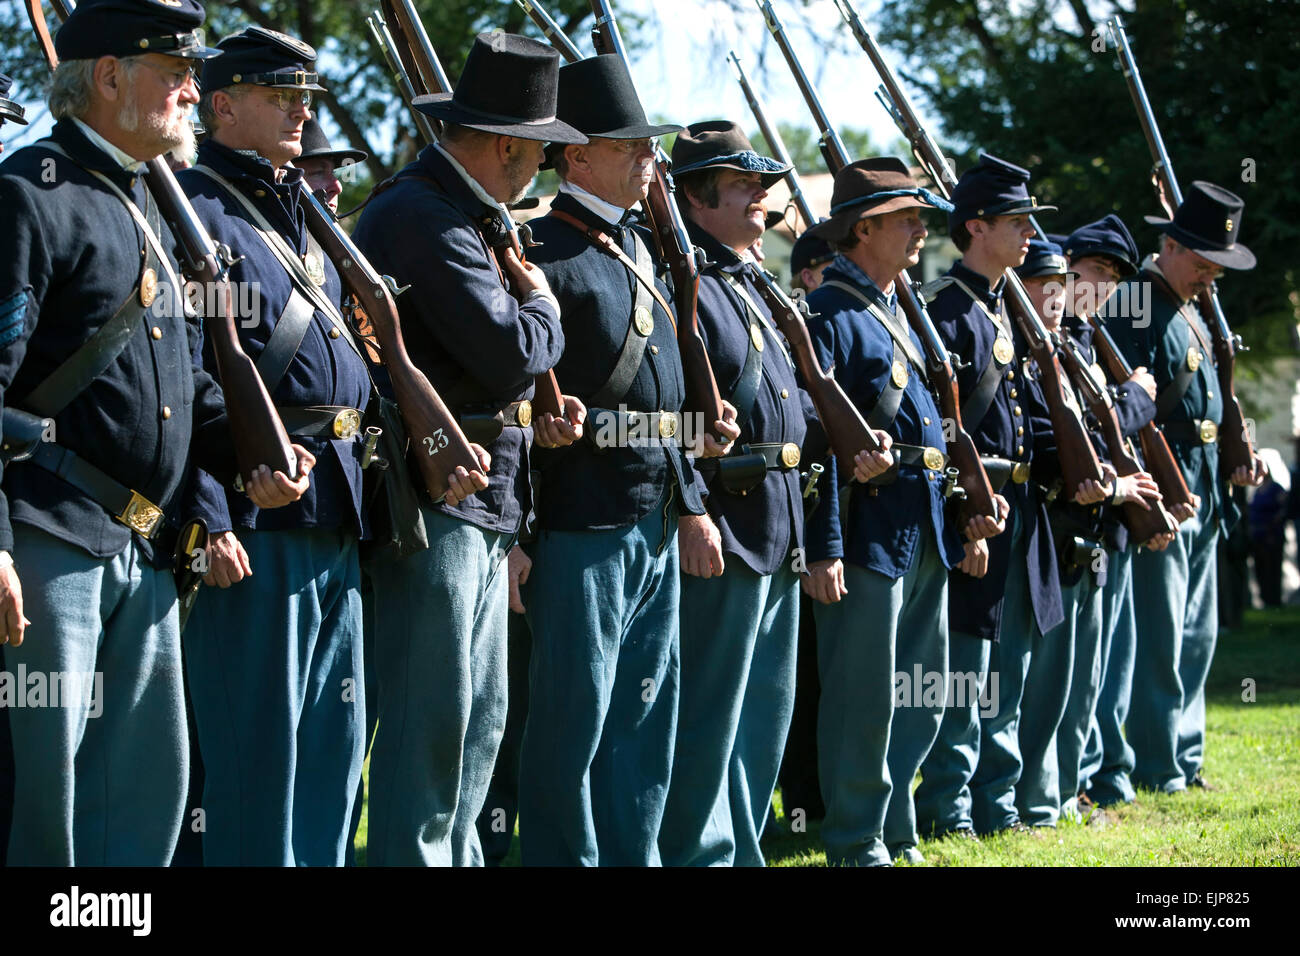 Civil war era union soldier reenactors at attention fort stanton live fort stanton new mexico usa